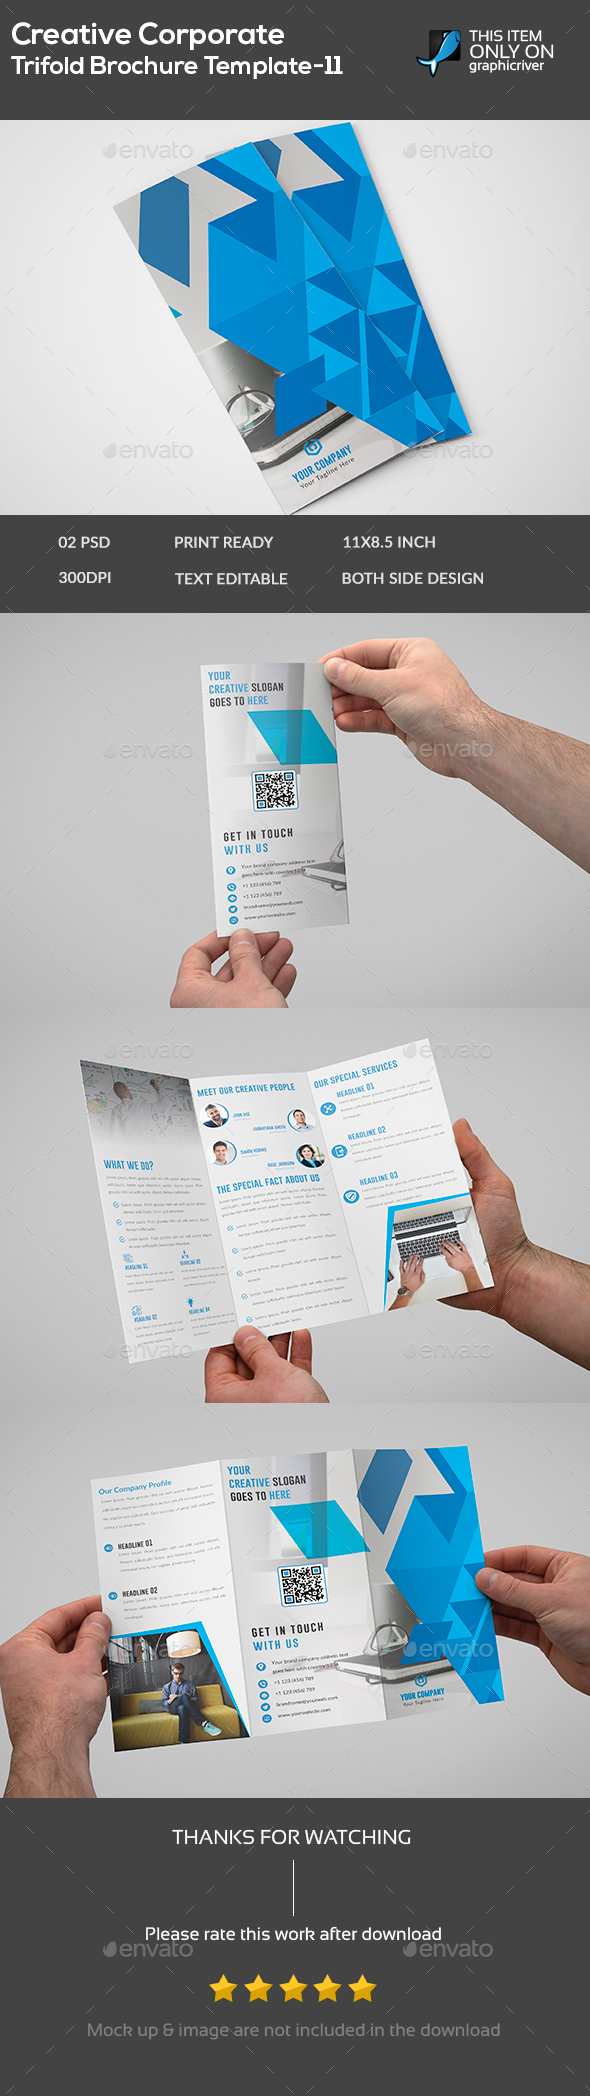 Corporate Brochure Template - Brochures Print Templates